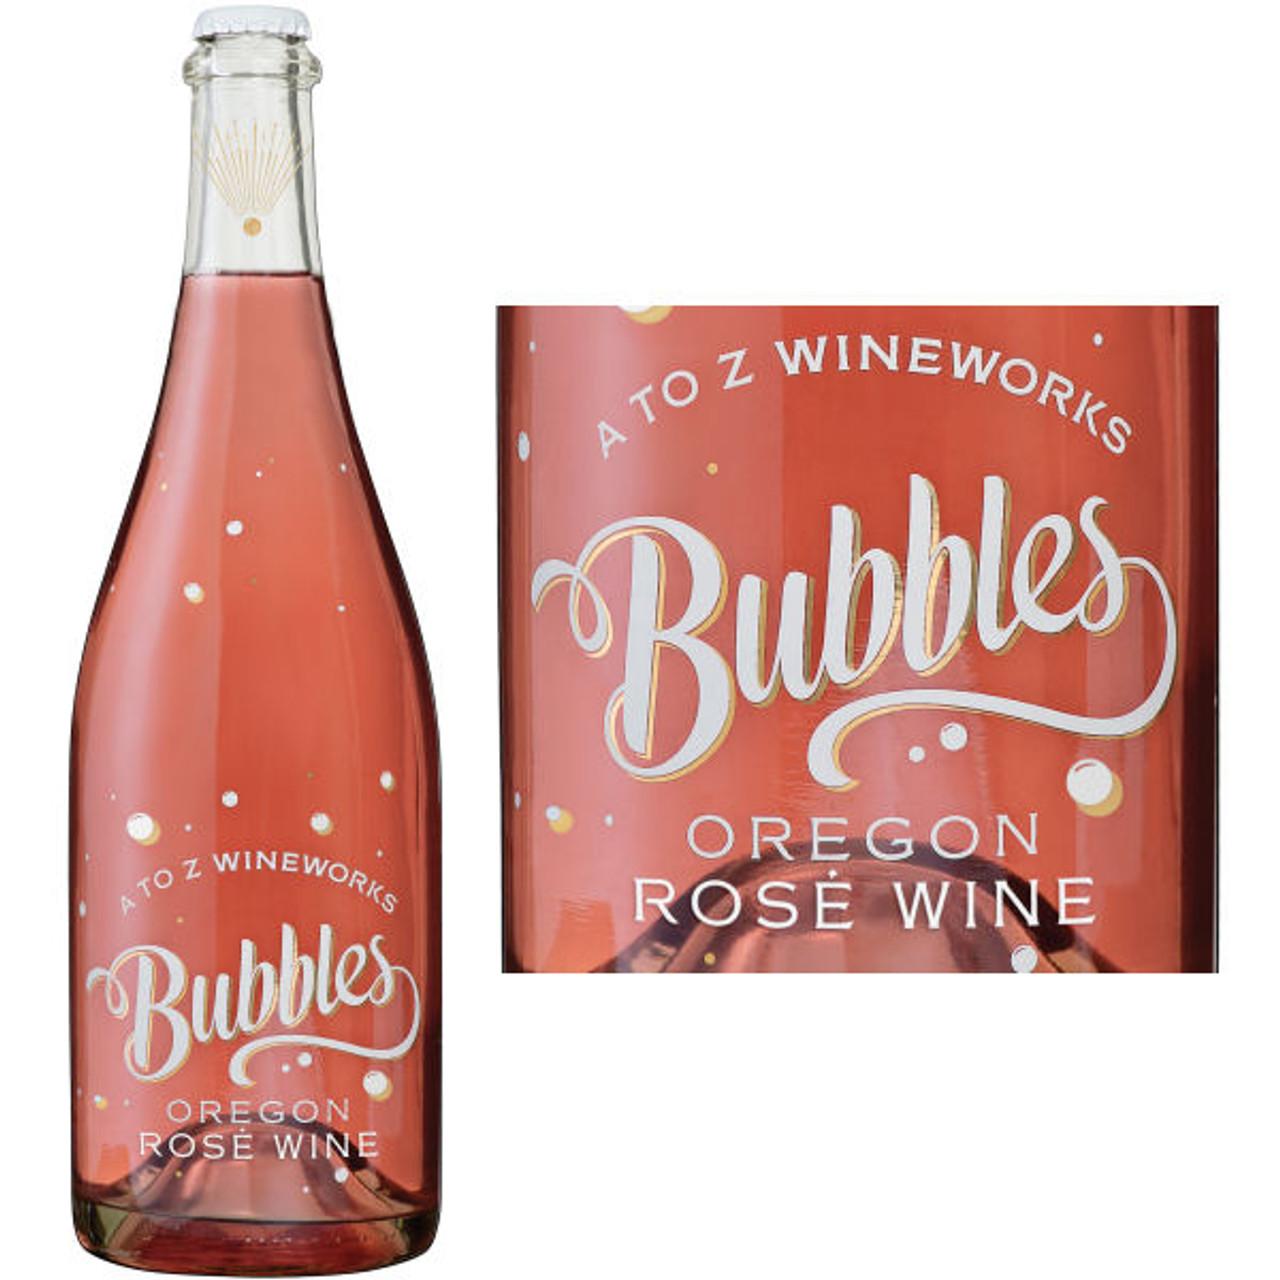 A to Z Wineworks Bubbles Oregon Rose Wine NV